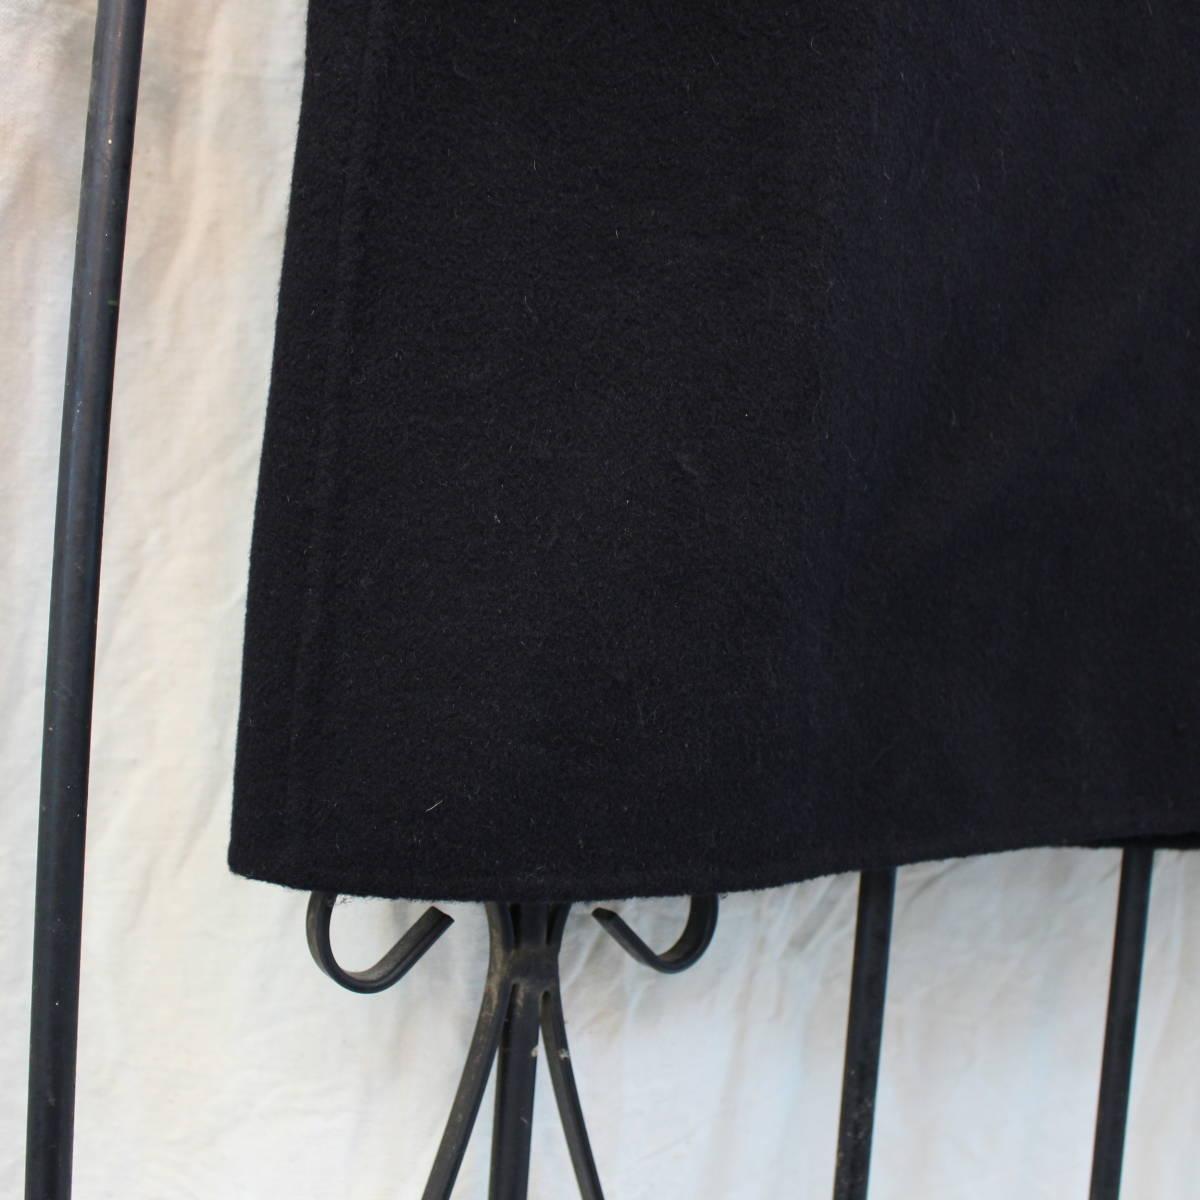 S'MAX MARA ANGORA BREND WOOL BELTED FOODED COAT/エスマックスマーラアンゴラ混ウールベルテッドフーデッドコート_画像7